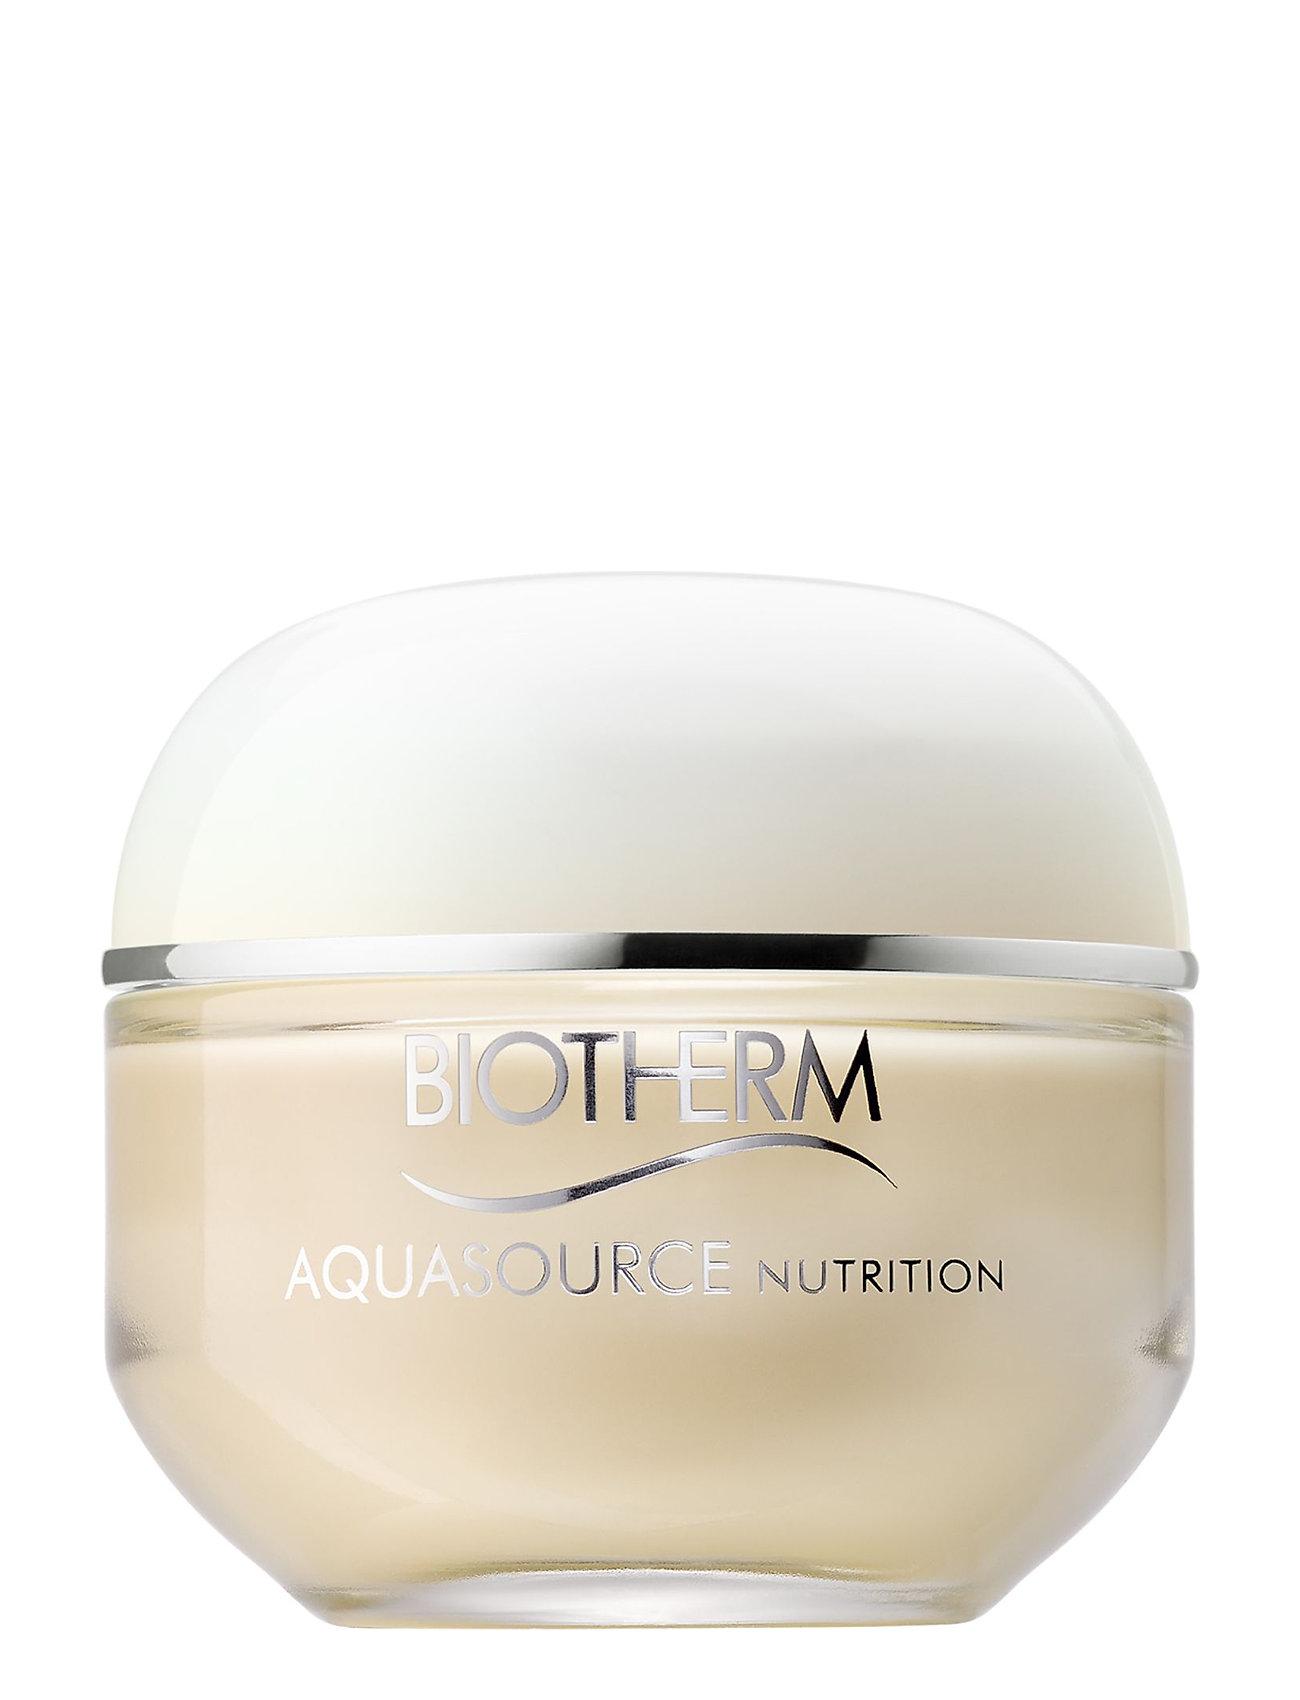 Nutrisource Day Cream - Dry Skin  50 Ml. Biotherm  til Damer i Klar